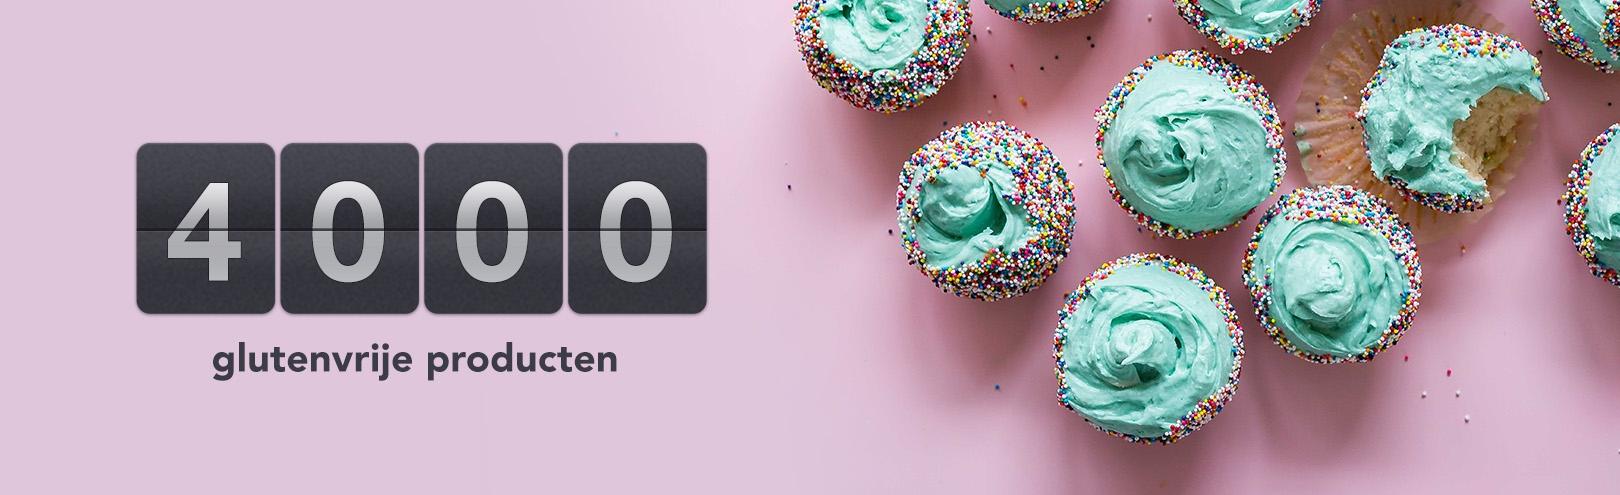 4000 Glutenvrije Producten